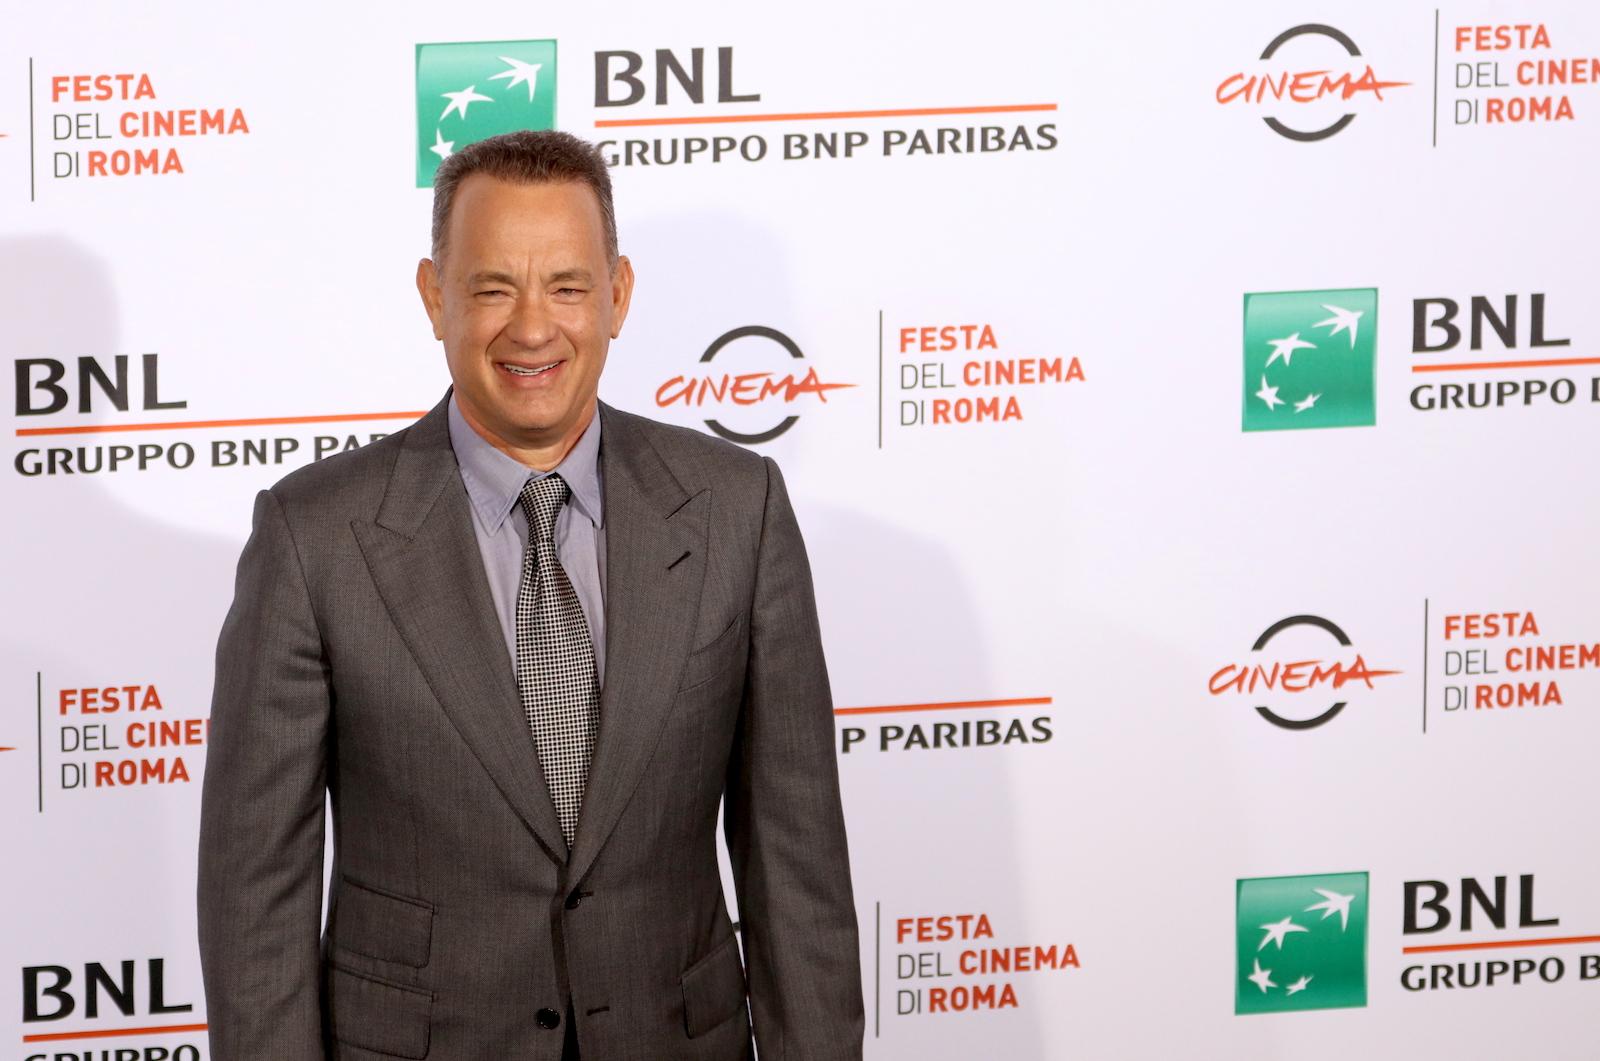 Roma 2016: Tom Hanks sorridente al photocall